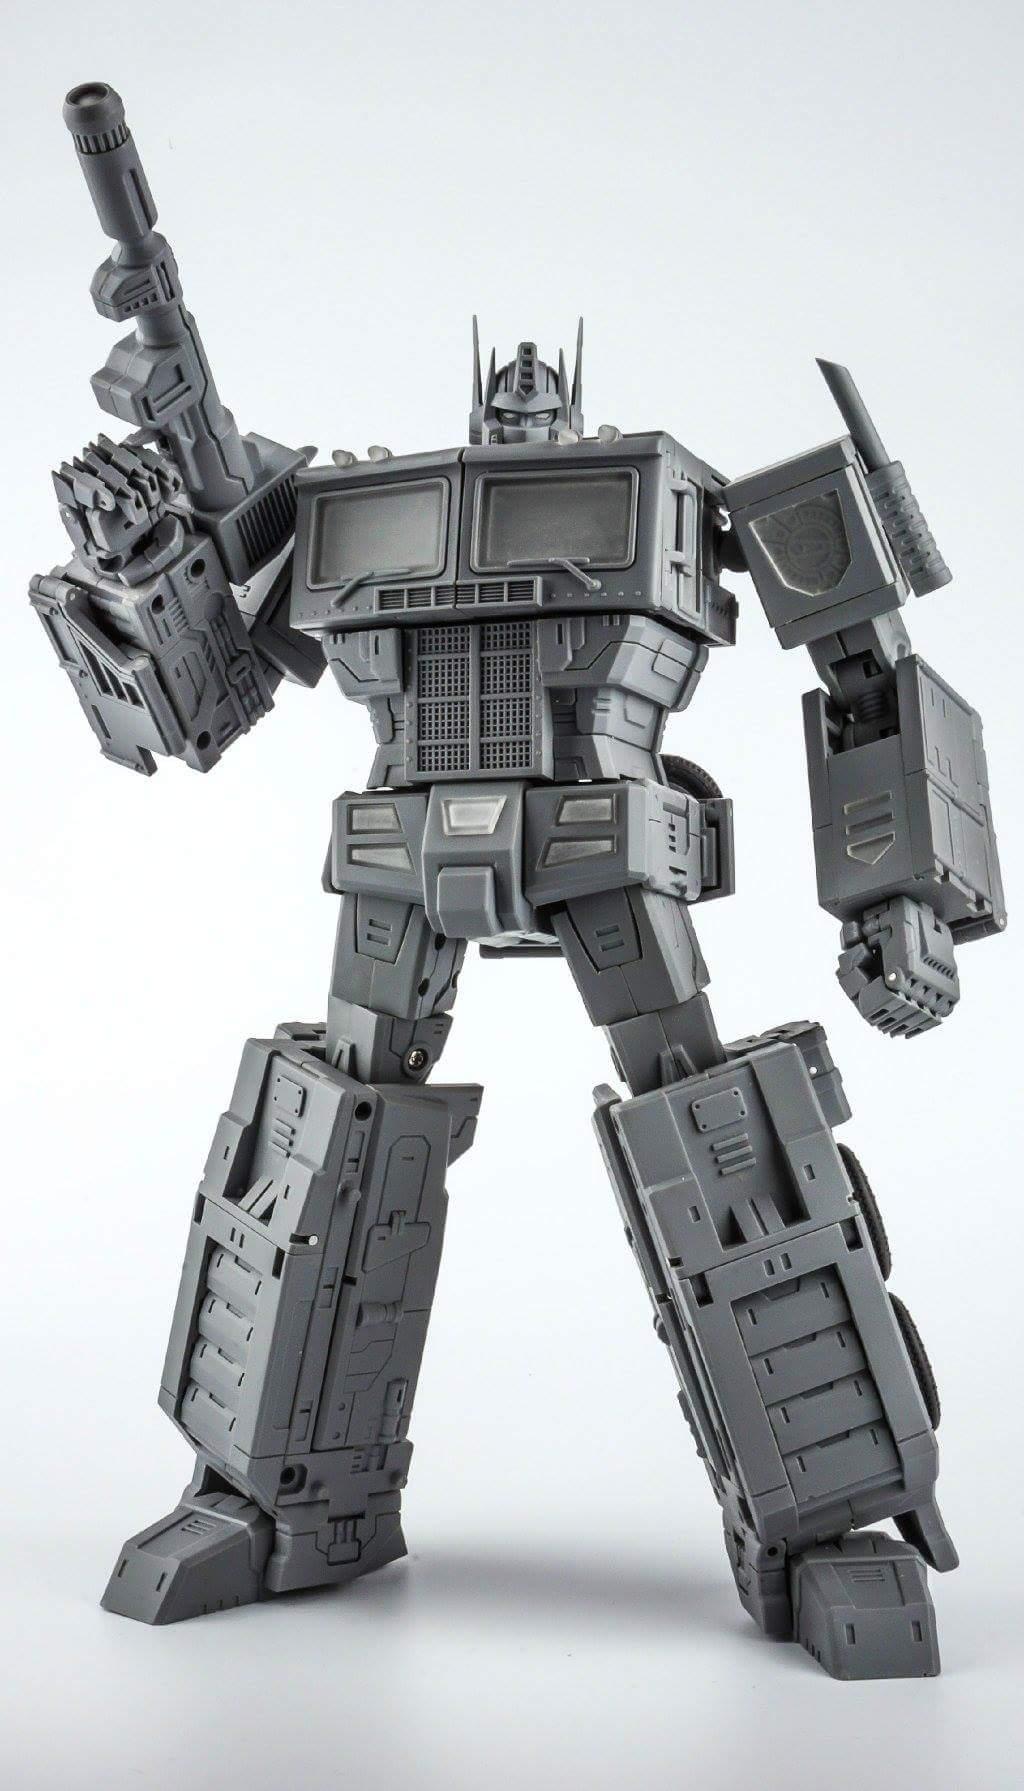 [ToyWorld][Zeta Toys] Produit Tiers - TW-M01 Primorion/Zeta-EX6O OriPrime et Zeta -EX6E EvaPrime - aka Optimus (G1 et Evangelion) Z7lBkgZE